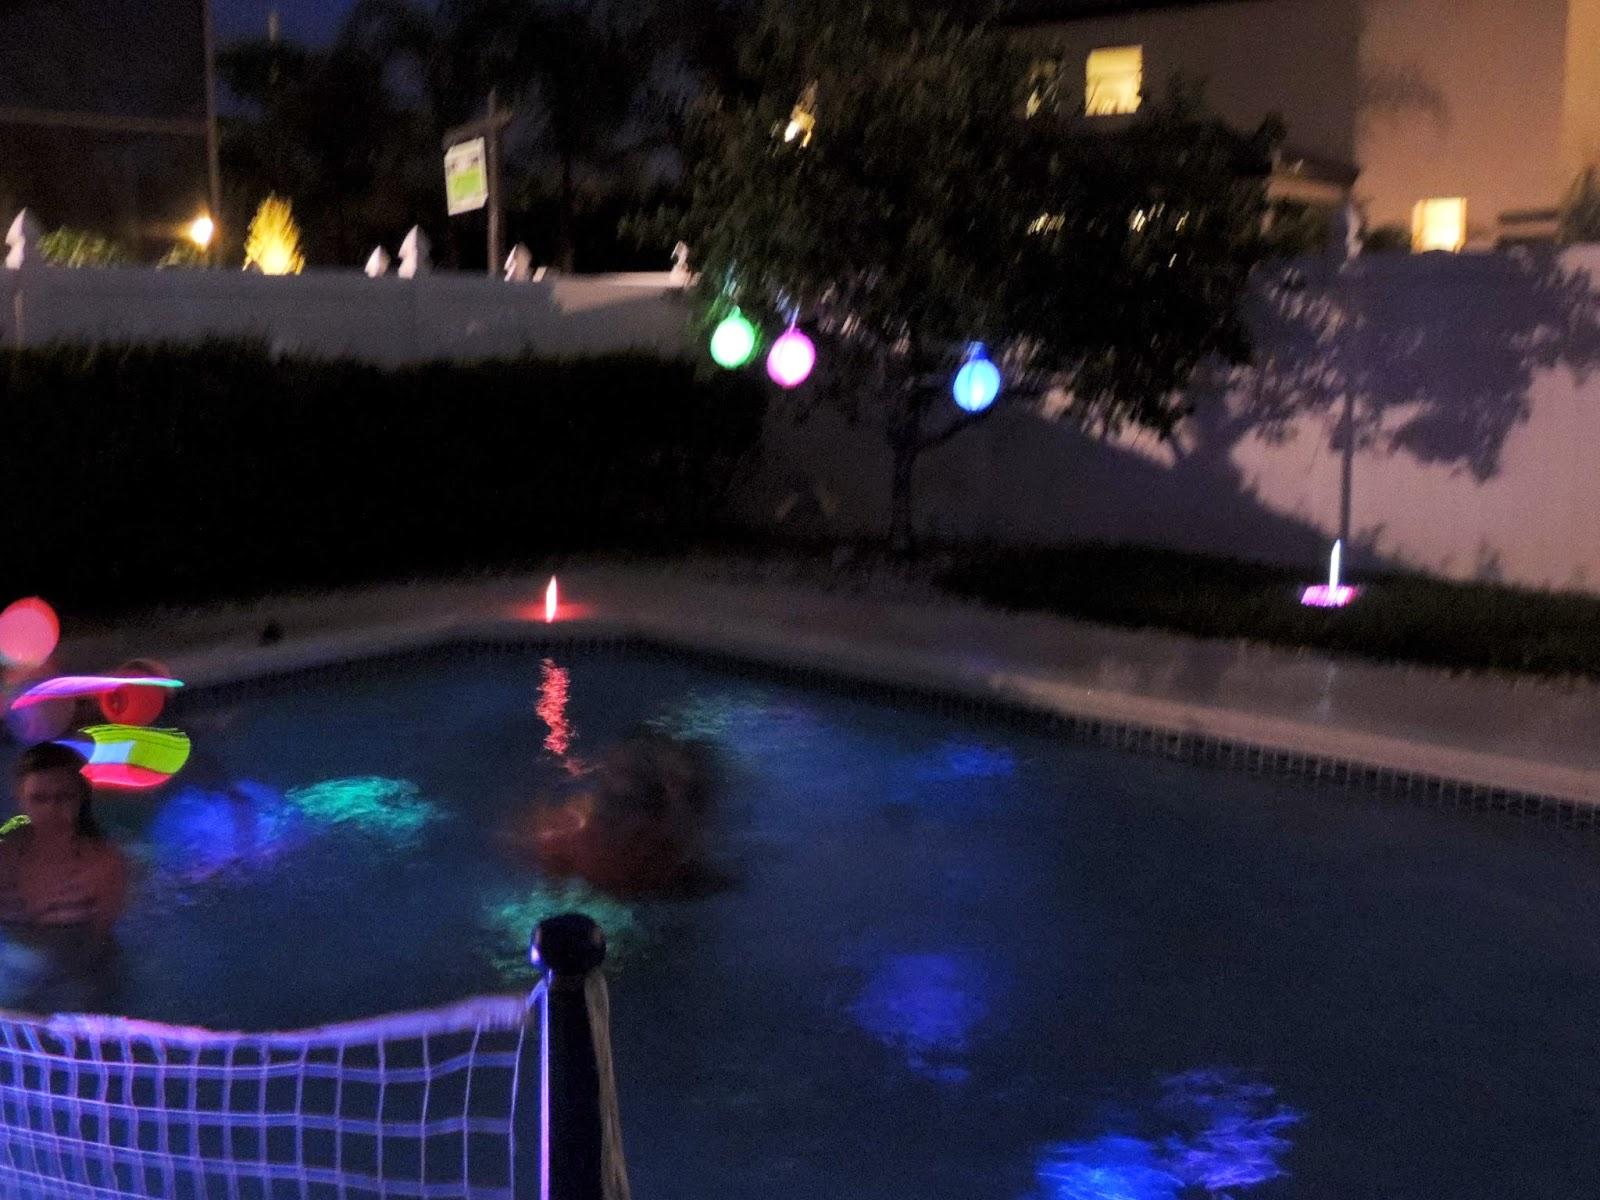 Juliana grace blog space glow in the dark pool party - Glow in the dark swimming pool toys ...